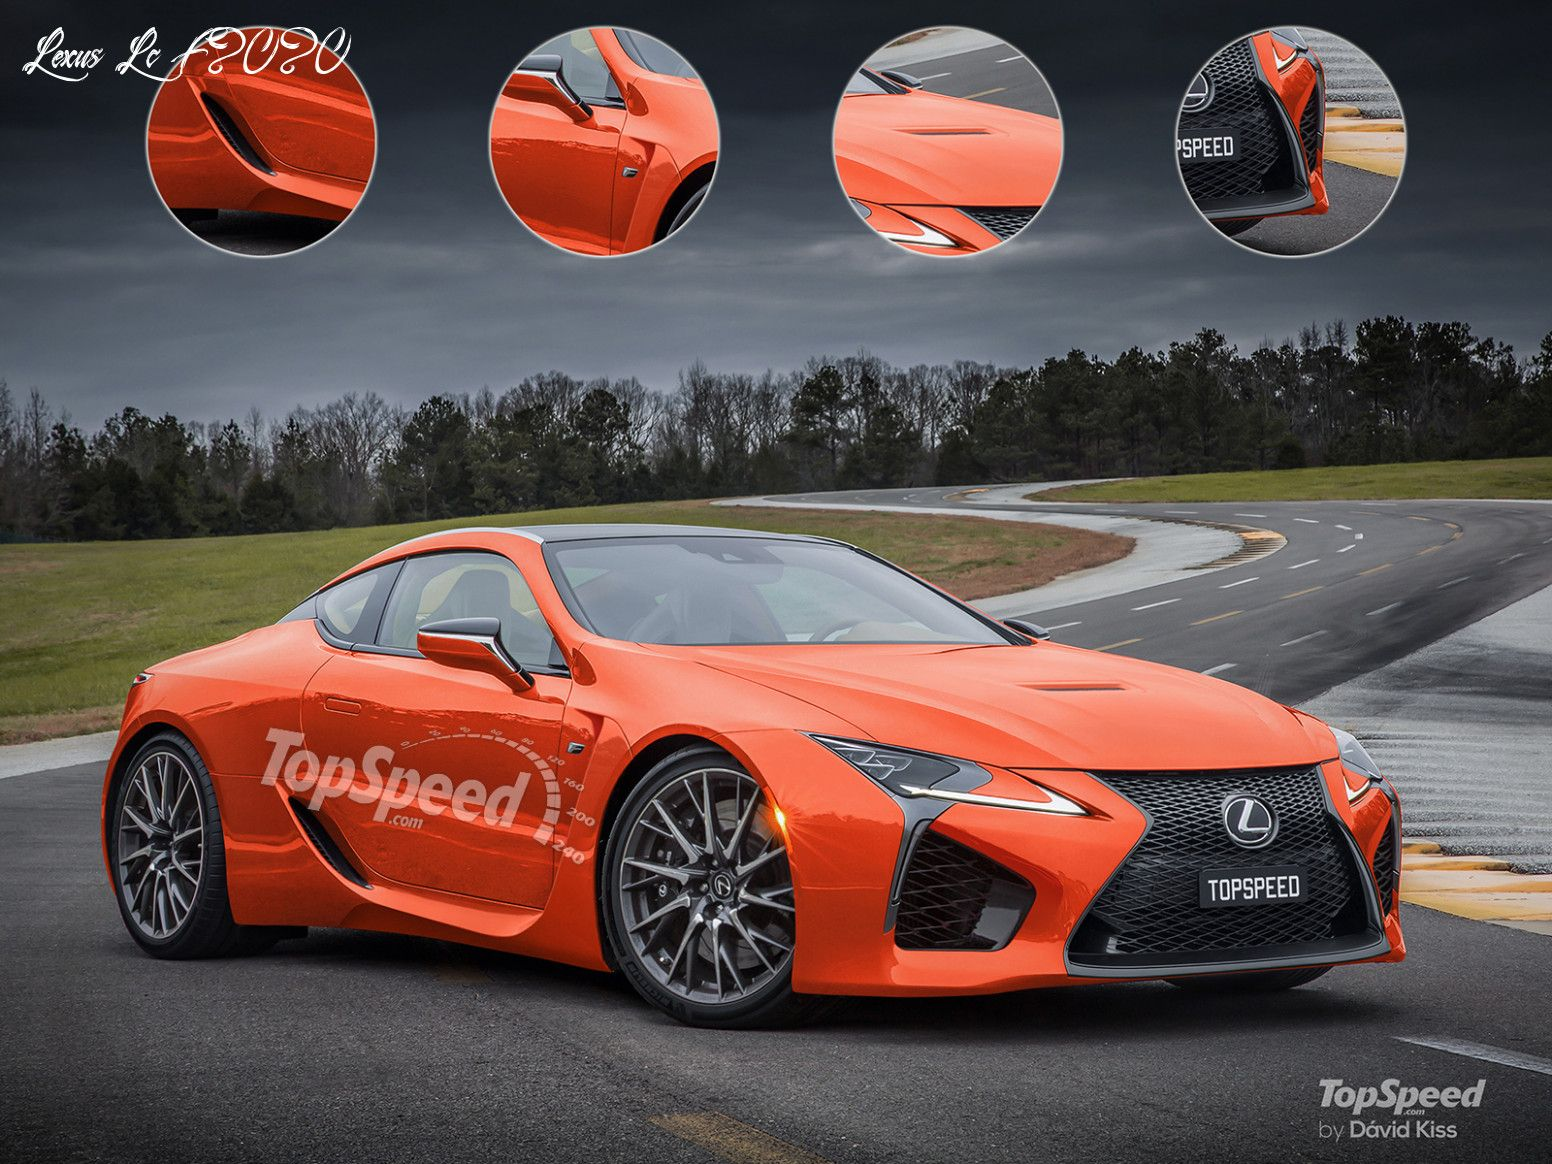 Lexus Lc F 2020 Speed Test In 2020 Lexus Sports Car Lexus Lc Lexus Sport